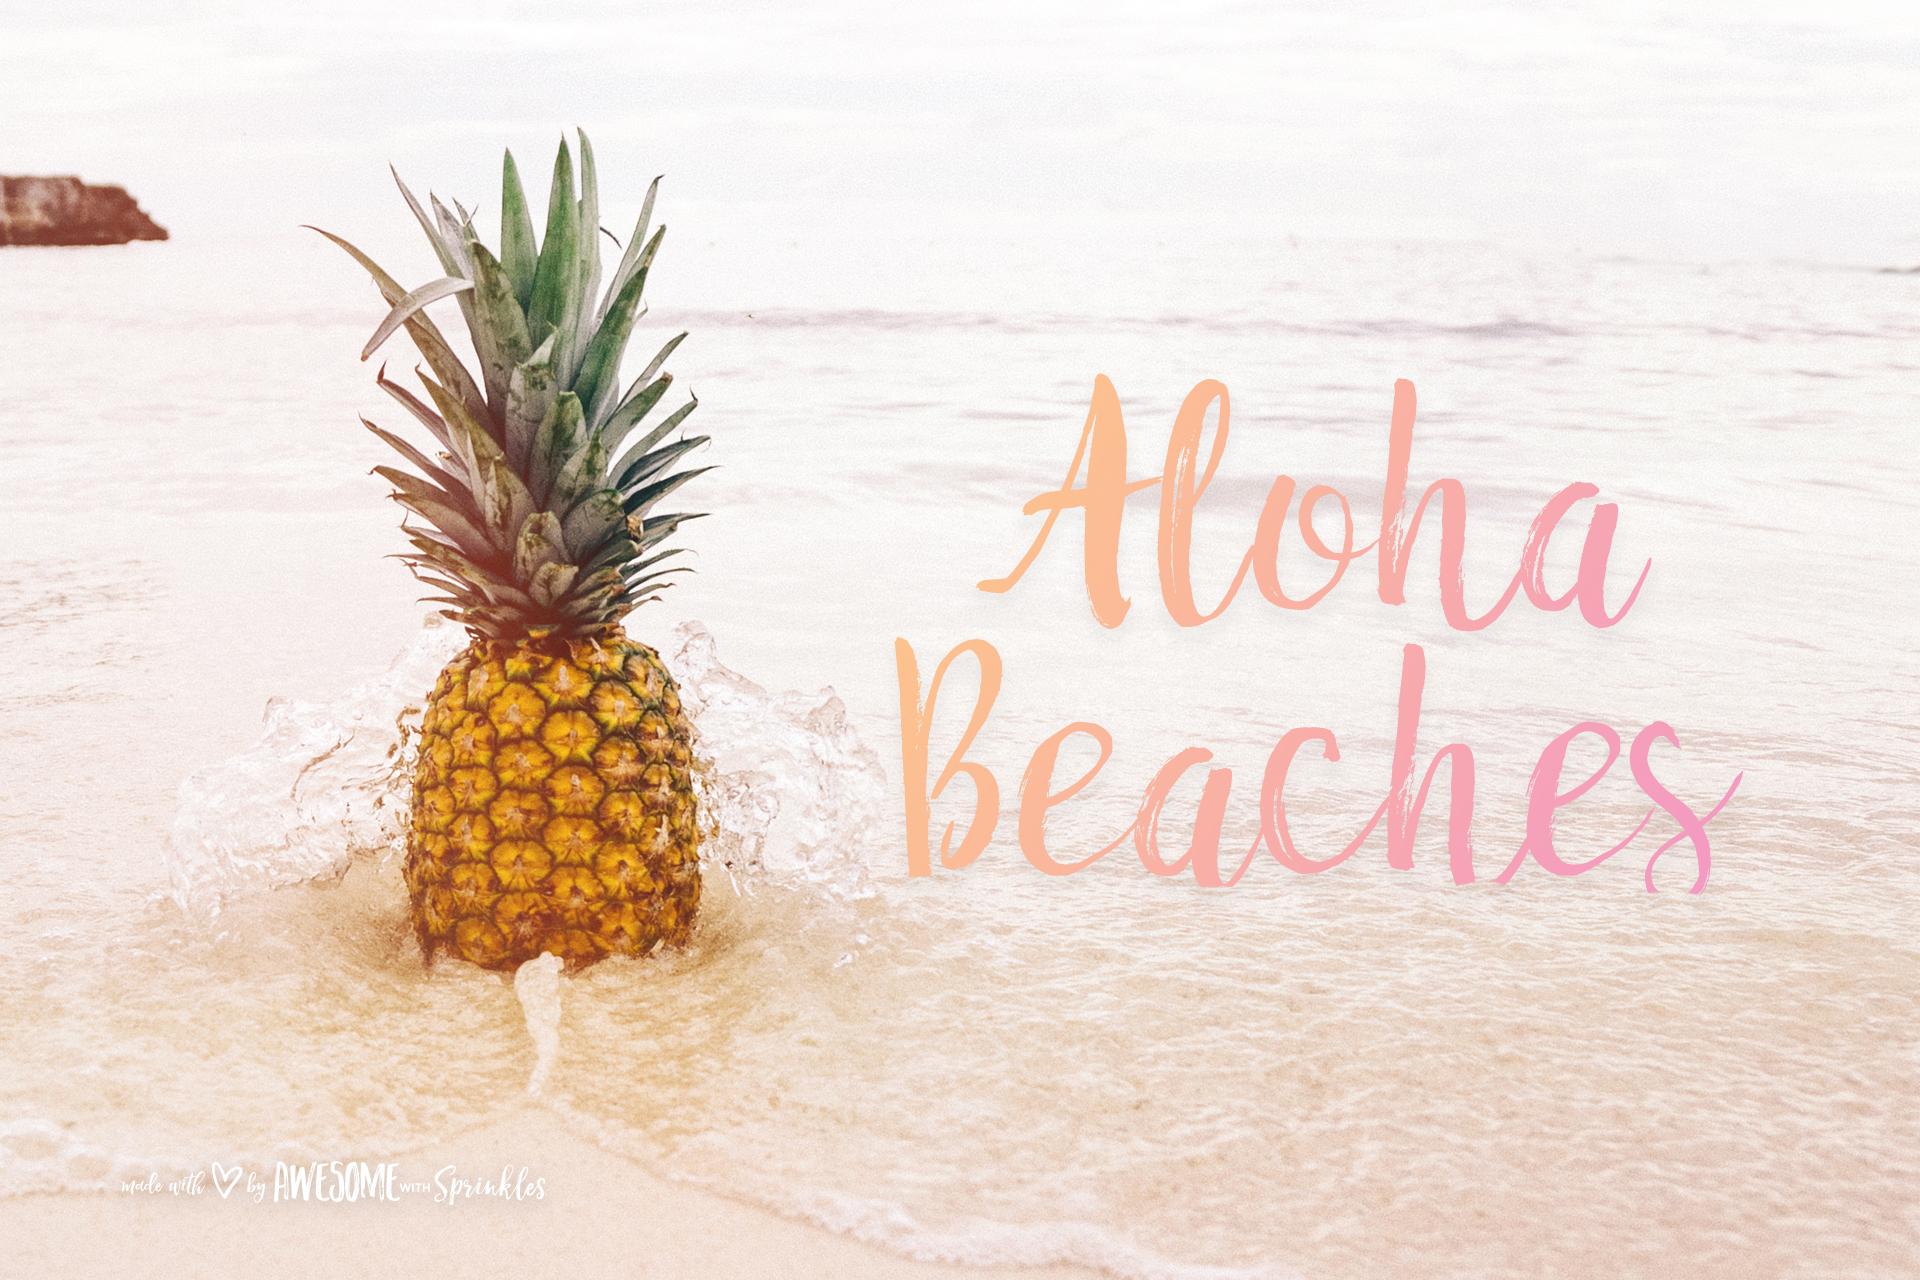 pineapple desktop wallpaper - photo #25